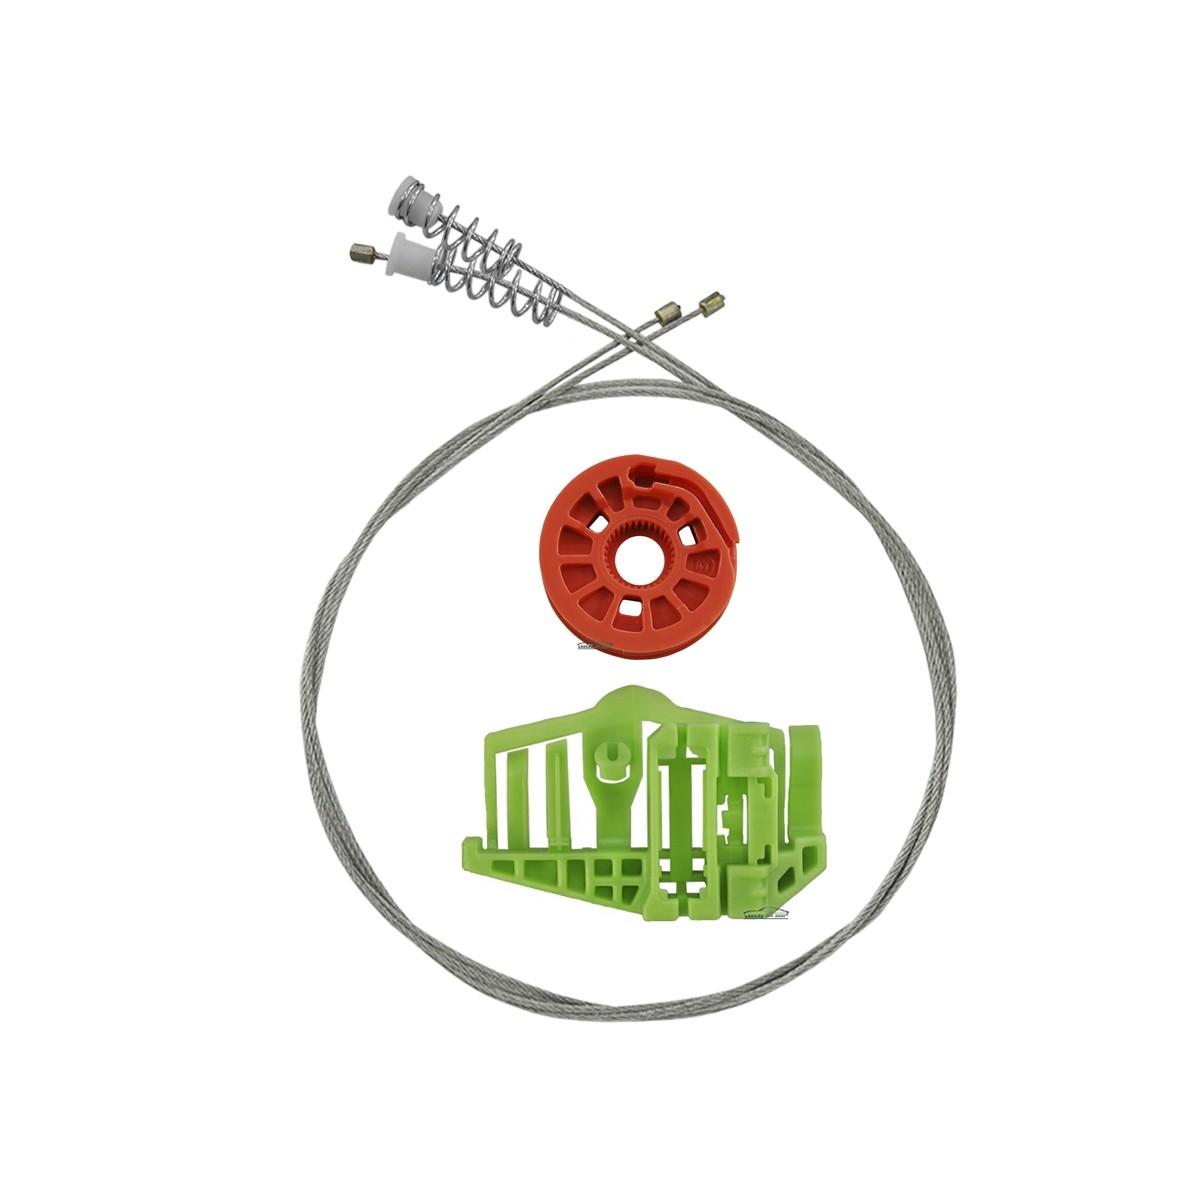 Kit Reparo Máquina de Vidro Elétrico Traseiro Bmw 318 320 325 Direito